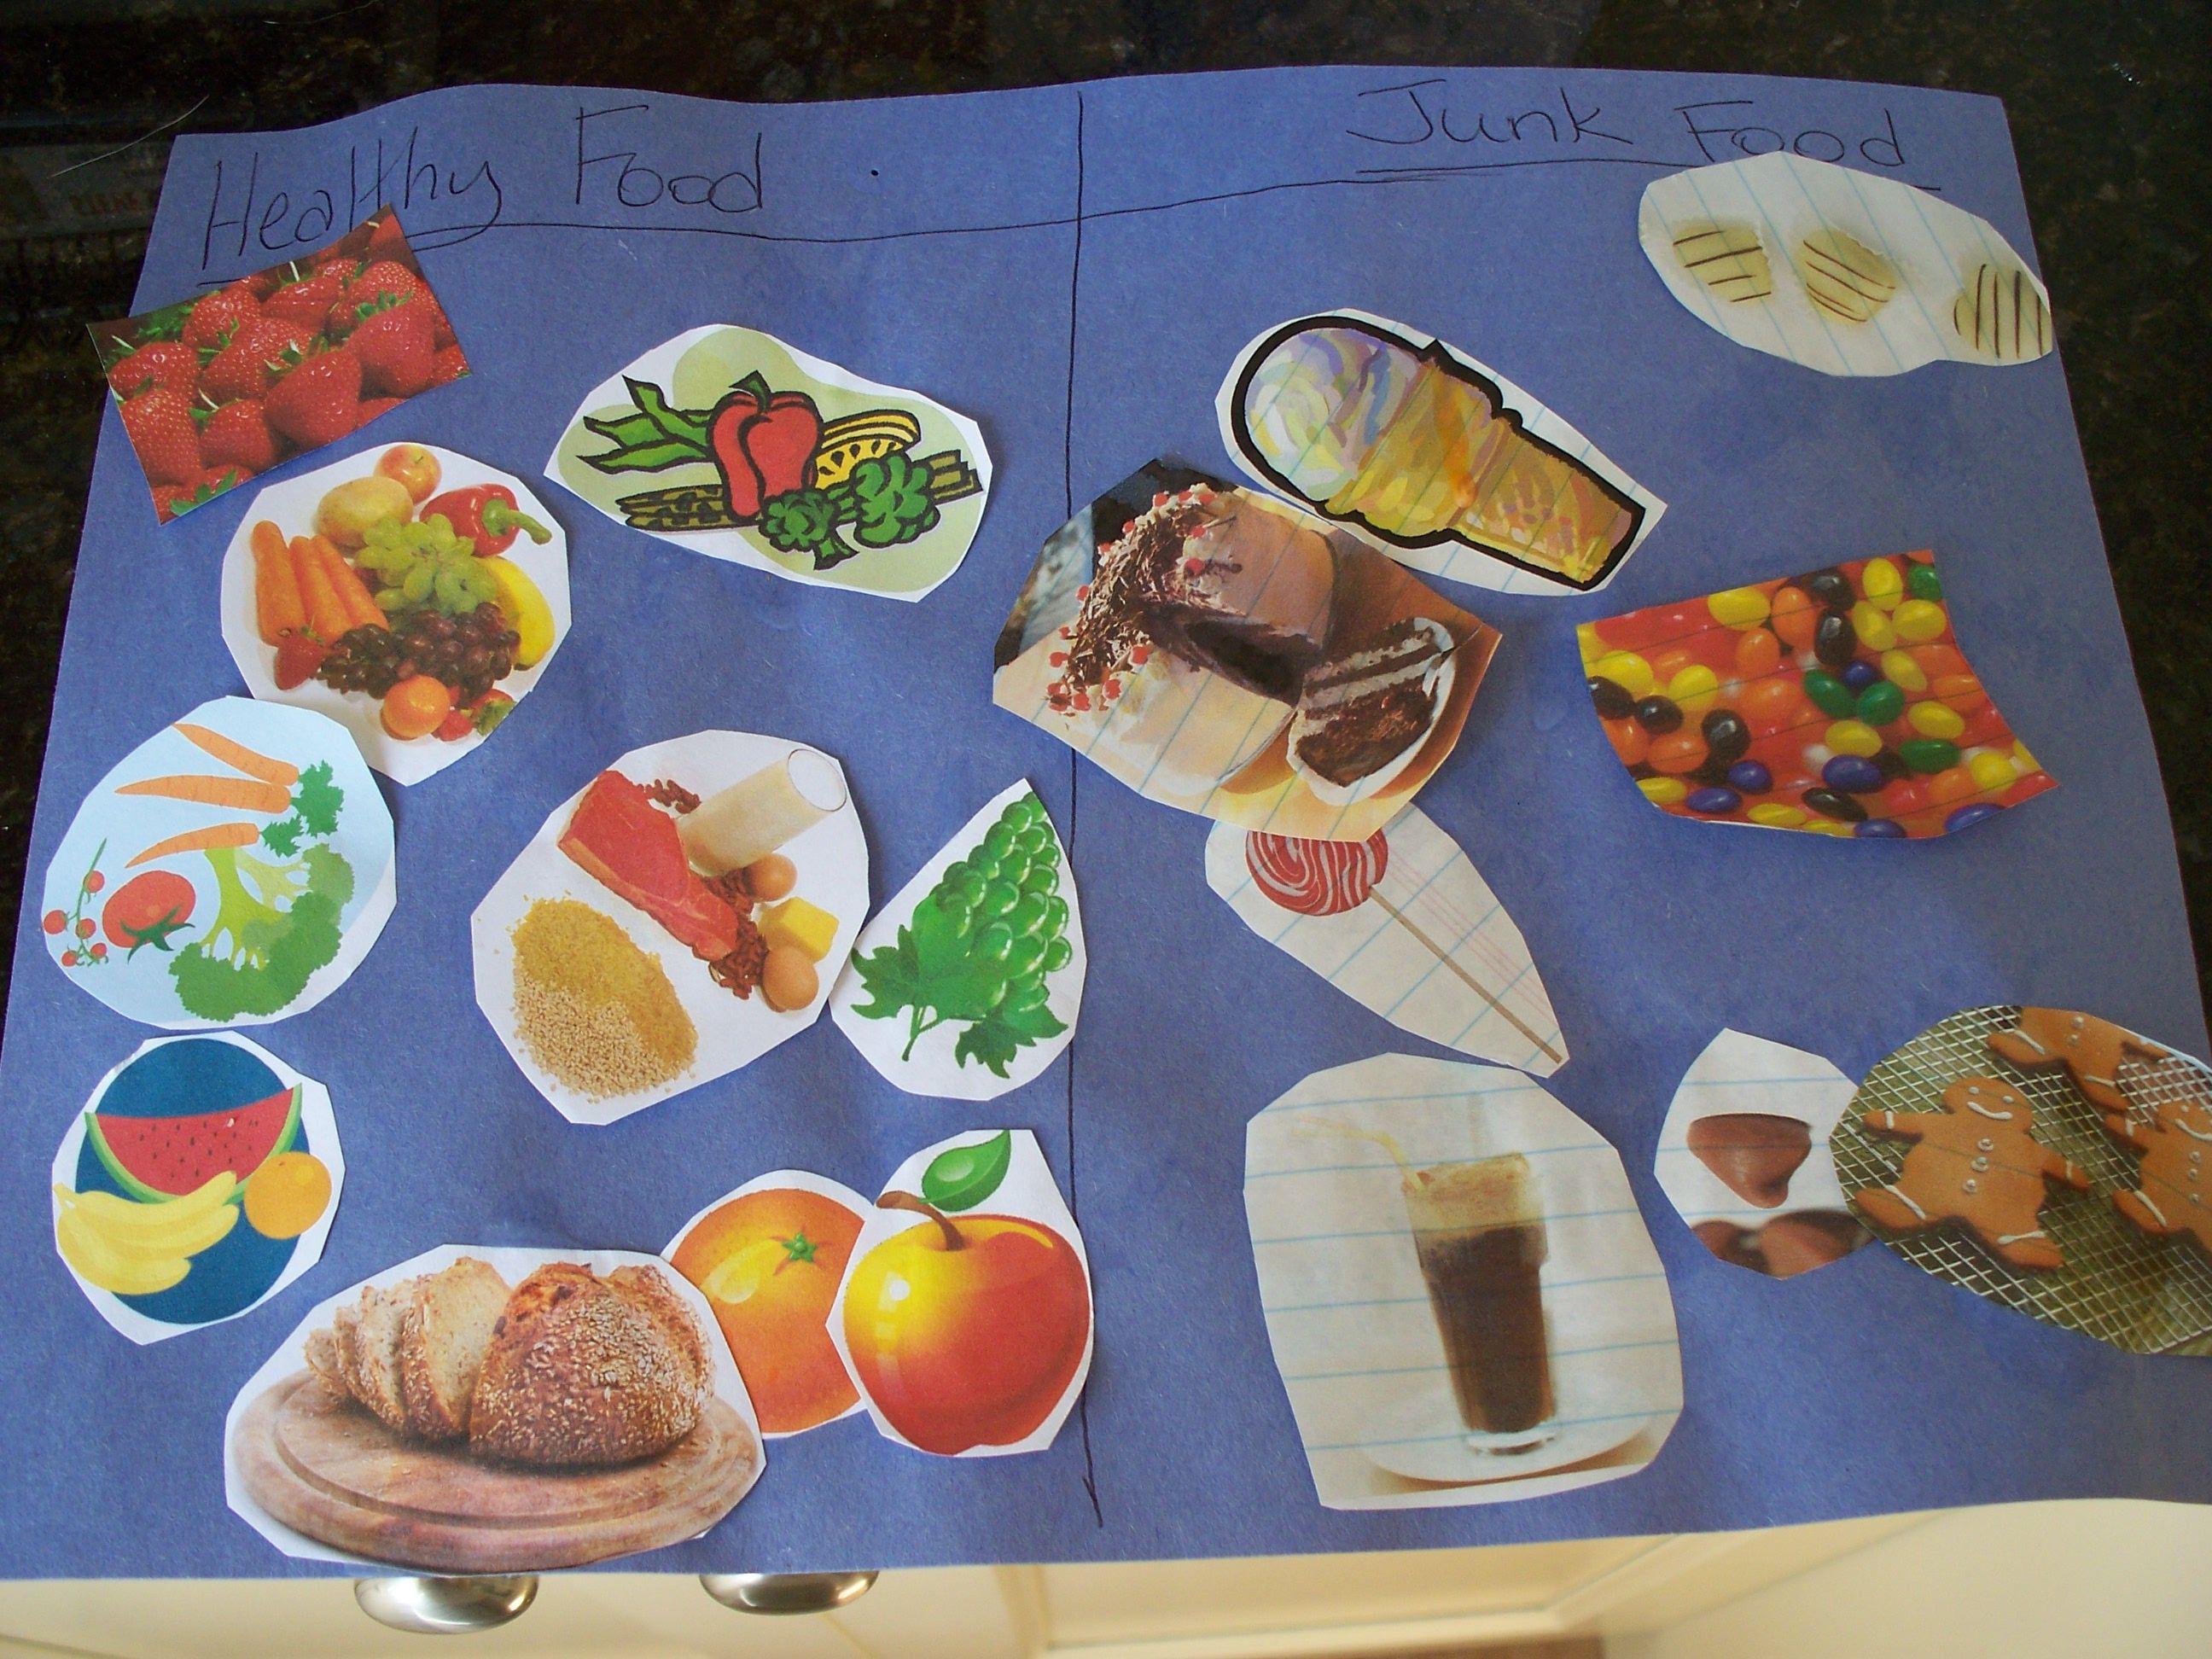 Sorting Healthy Food From Junk Food